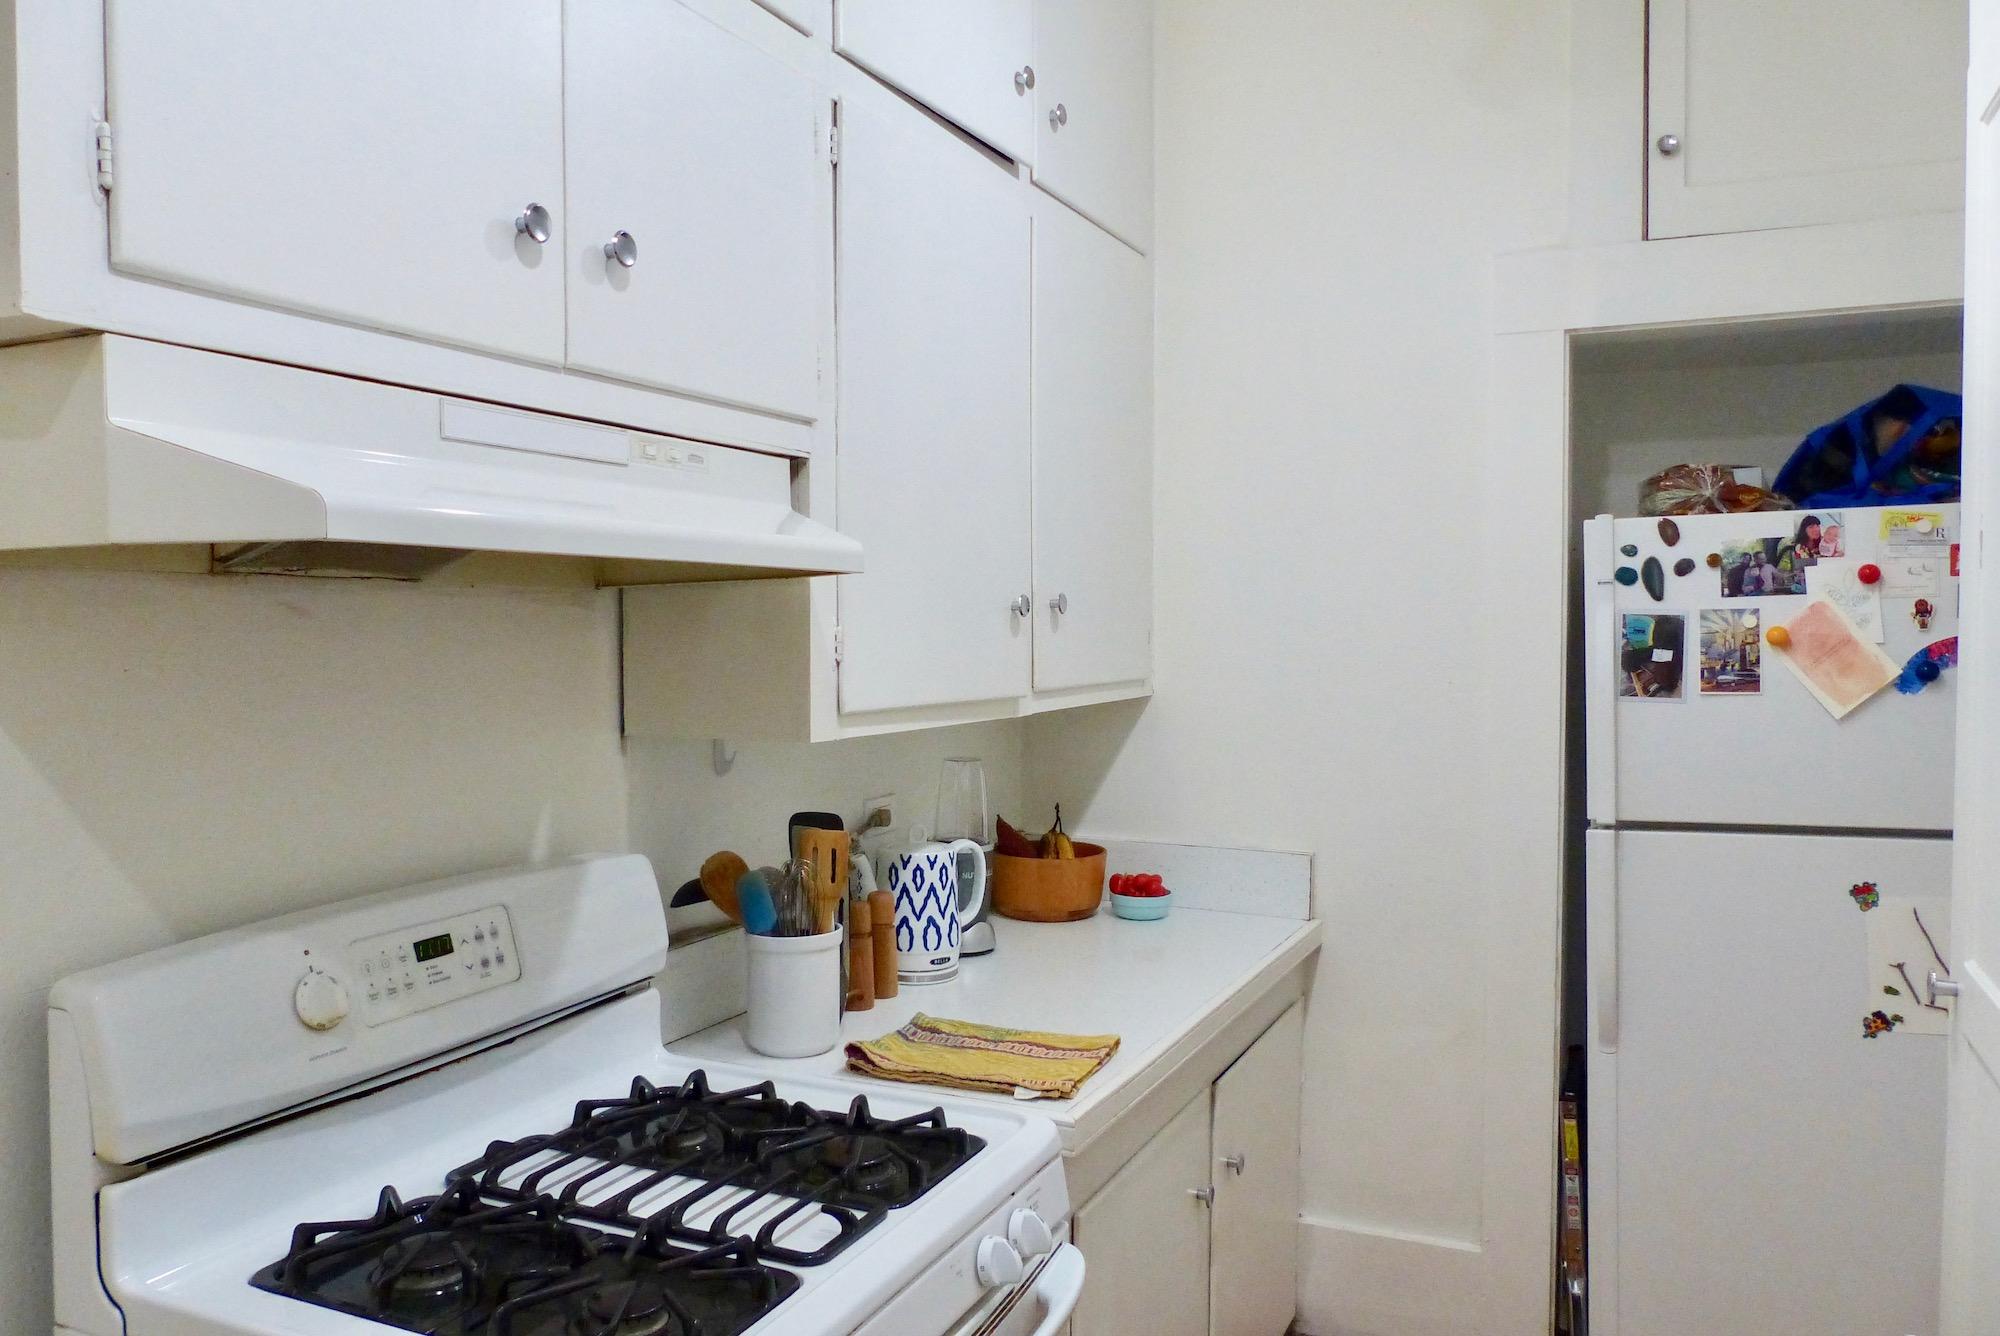 Range:refrigerator.jpg